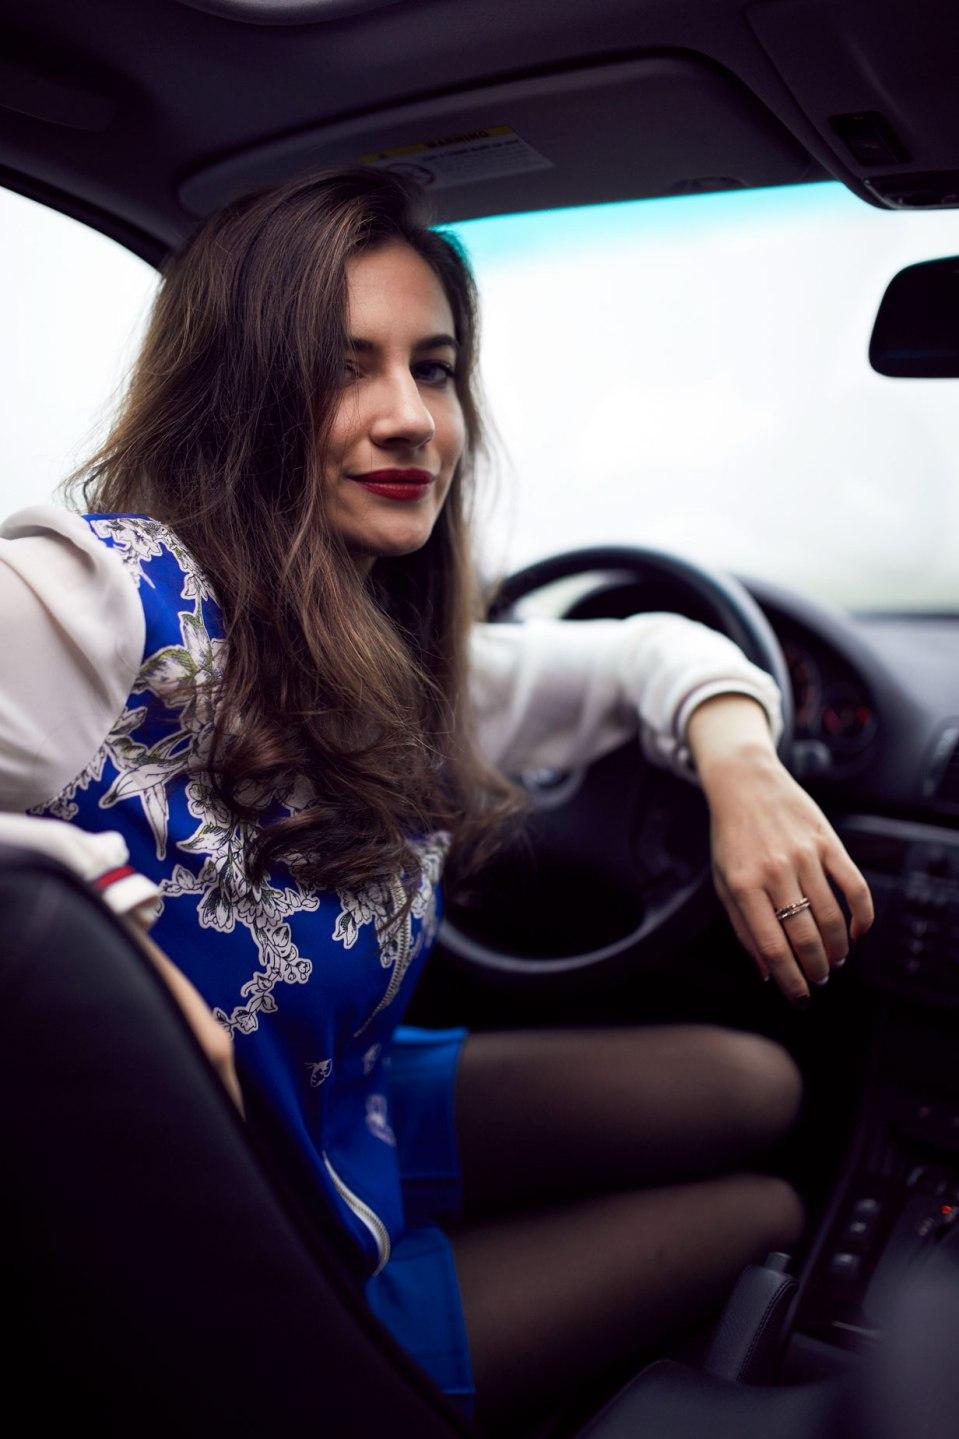 girl-car-photoshoot